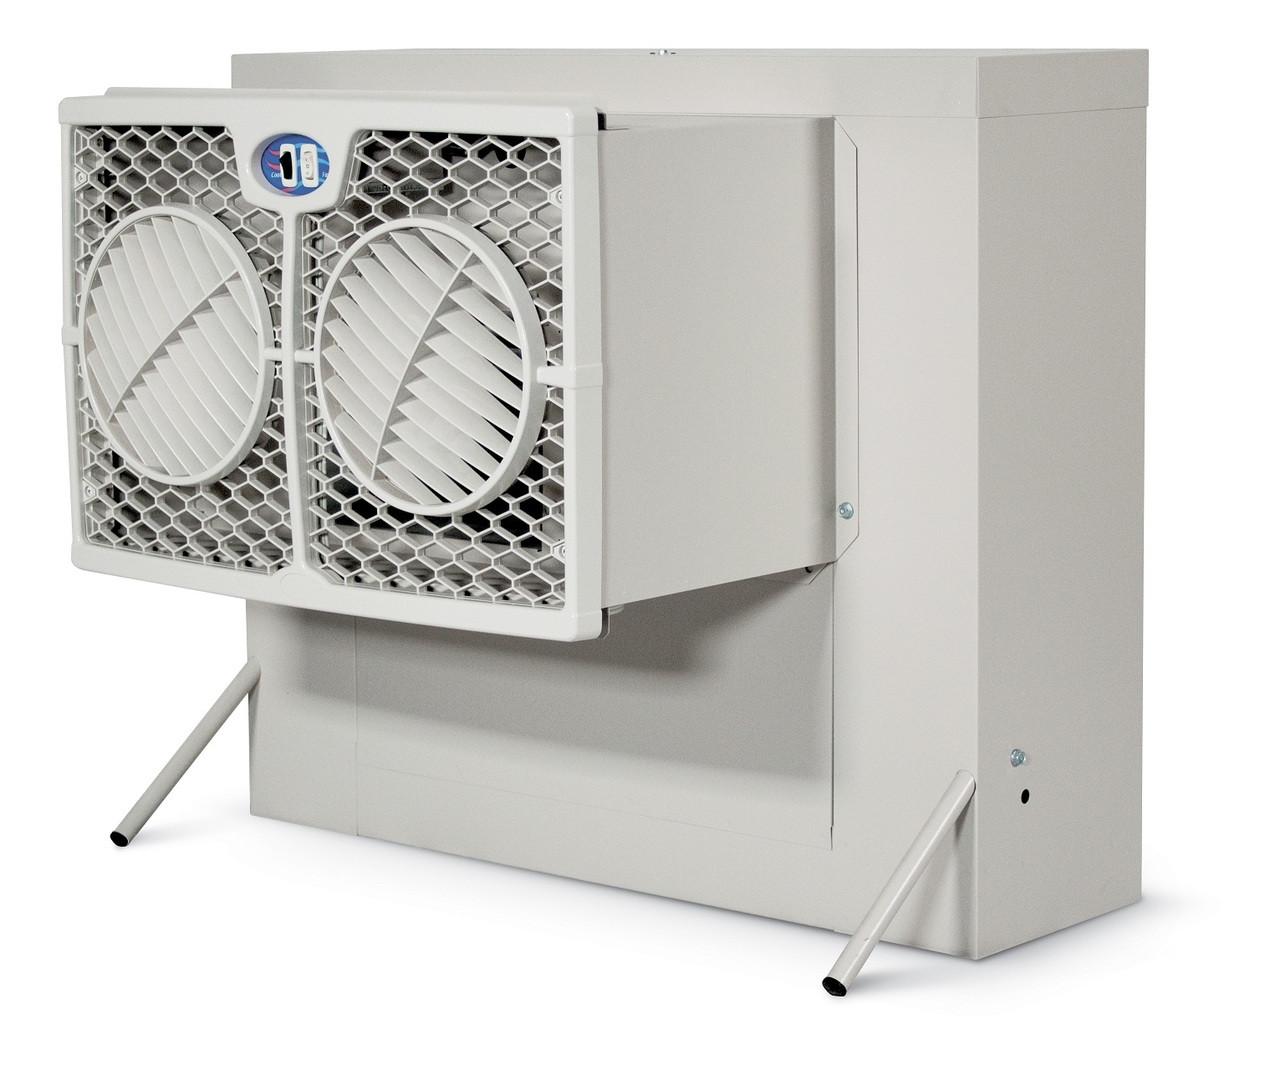 Window Evaporative Coolers : Slimline window evaporative cooler cfm brisa wh